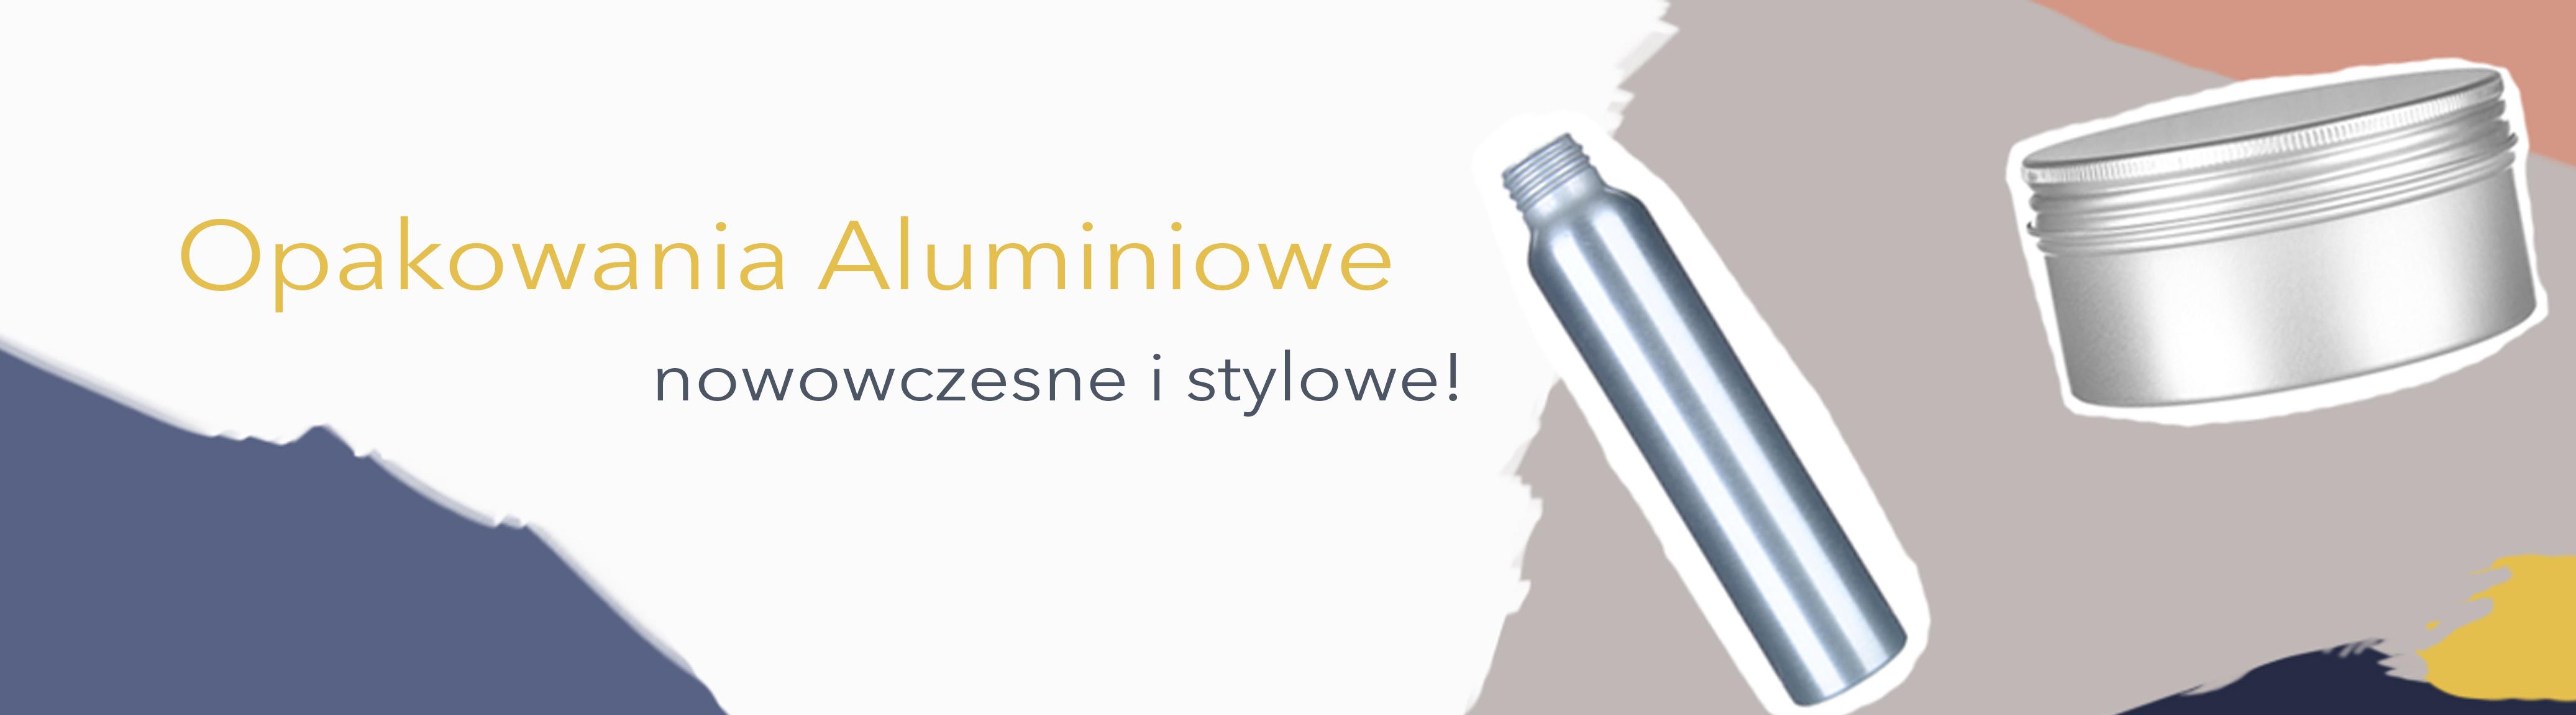 Słoiki aluminiowe, butelki aluminiowe